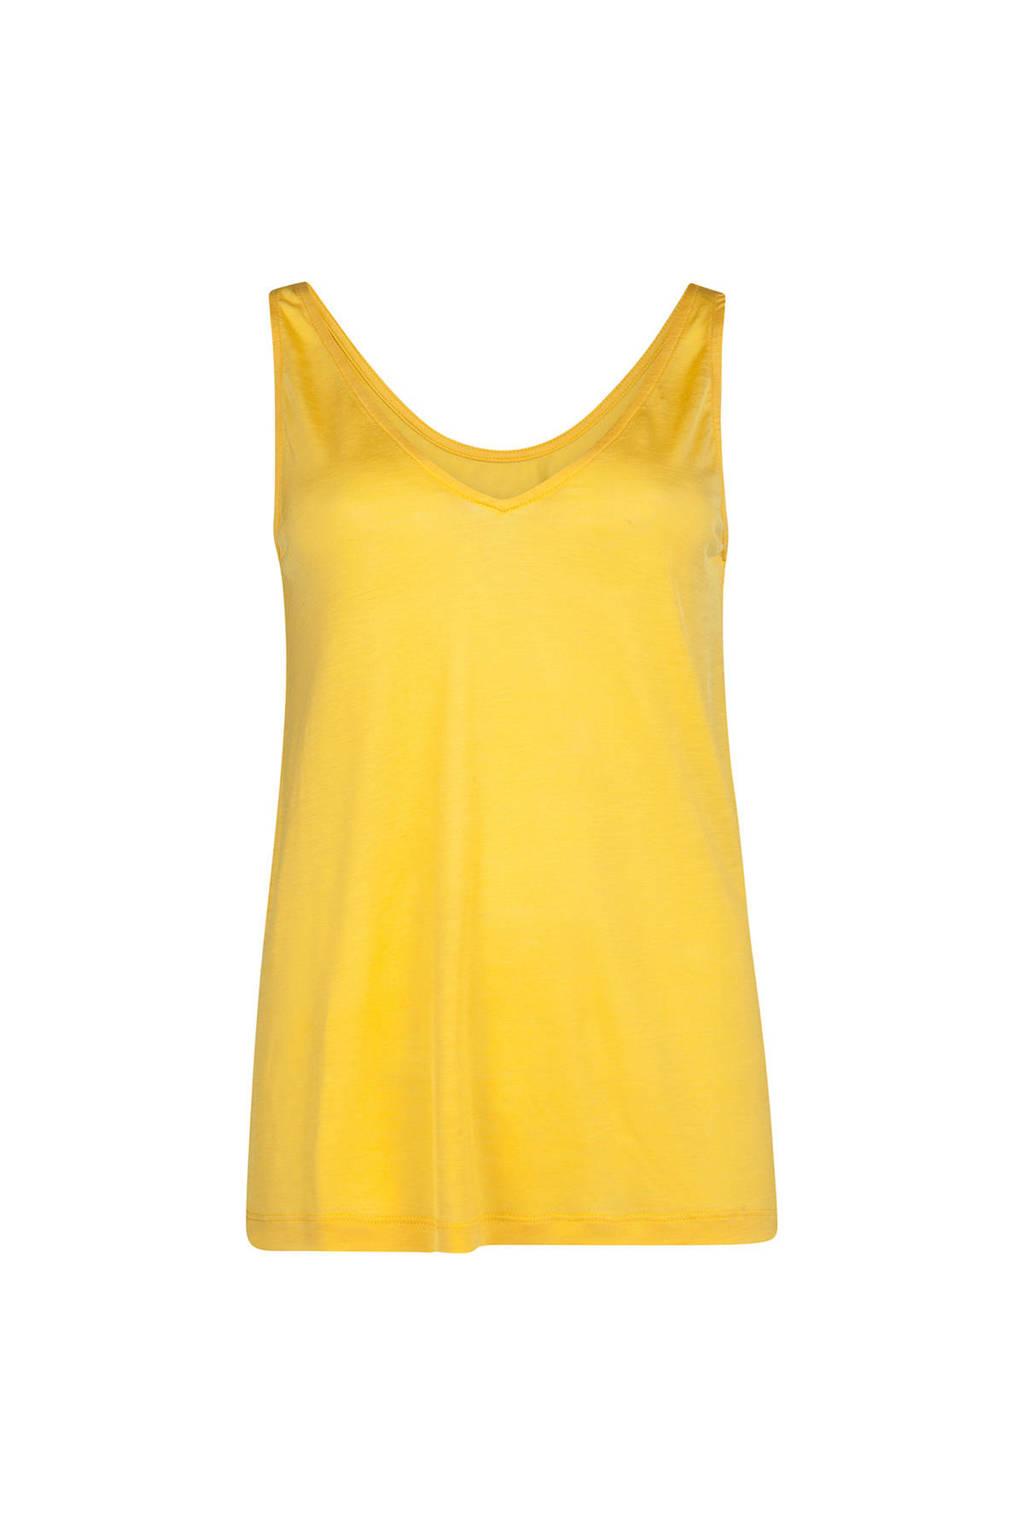 WE Fashion singlet geel, Geel